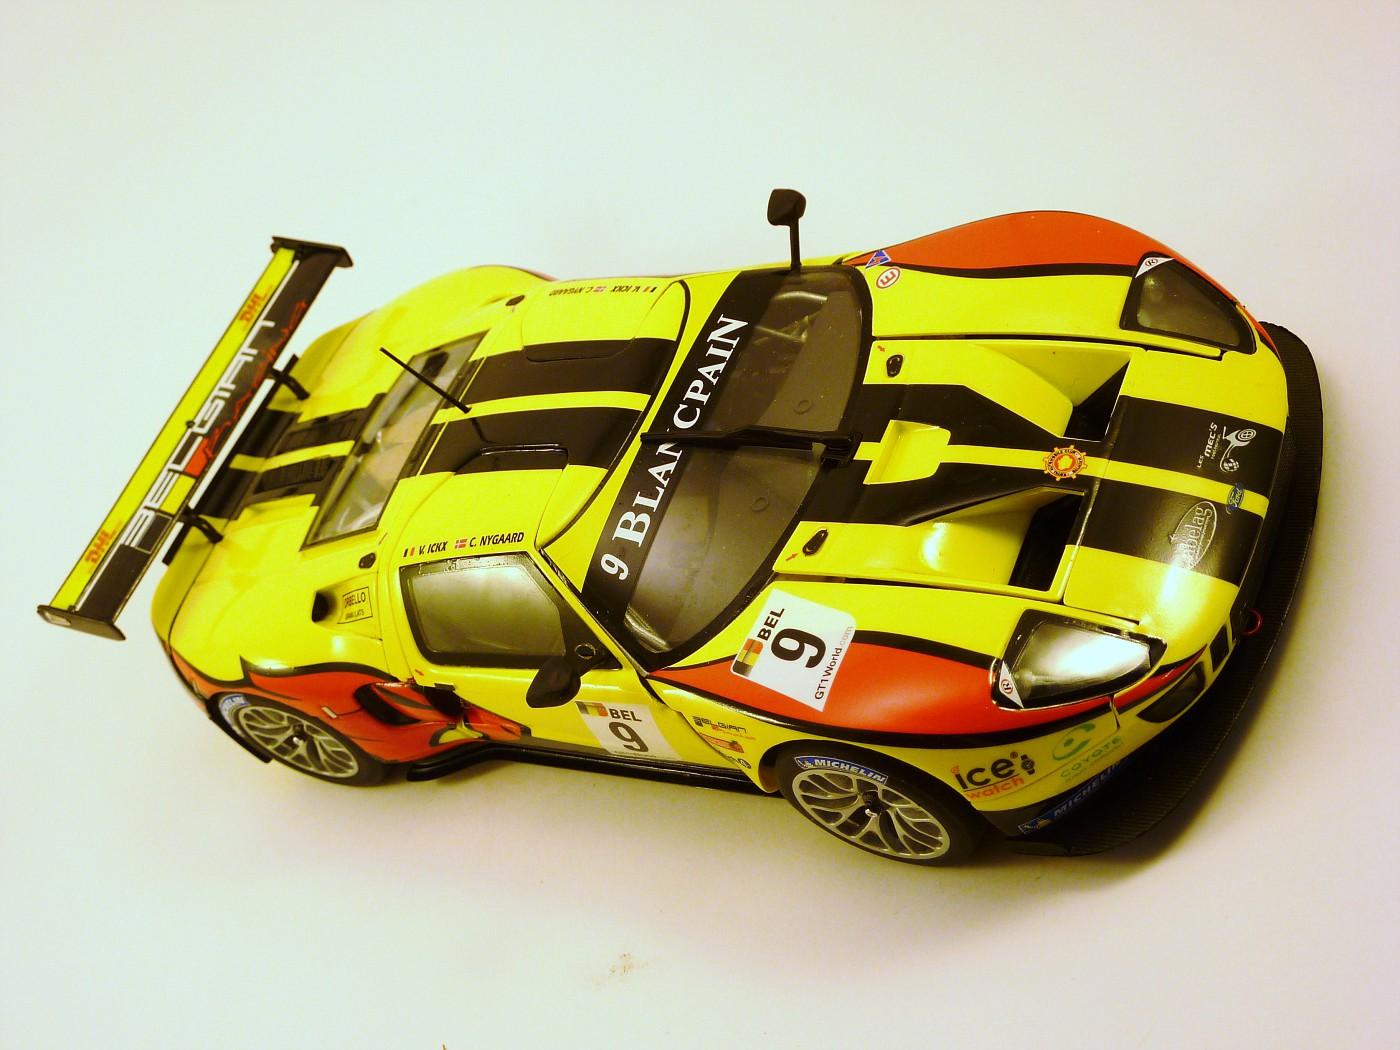 Ford gt1 Belgian racing FinalesFordGt1BelgianRacing015-vi